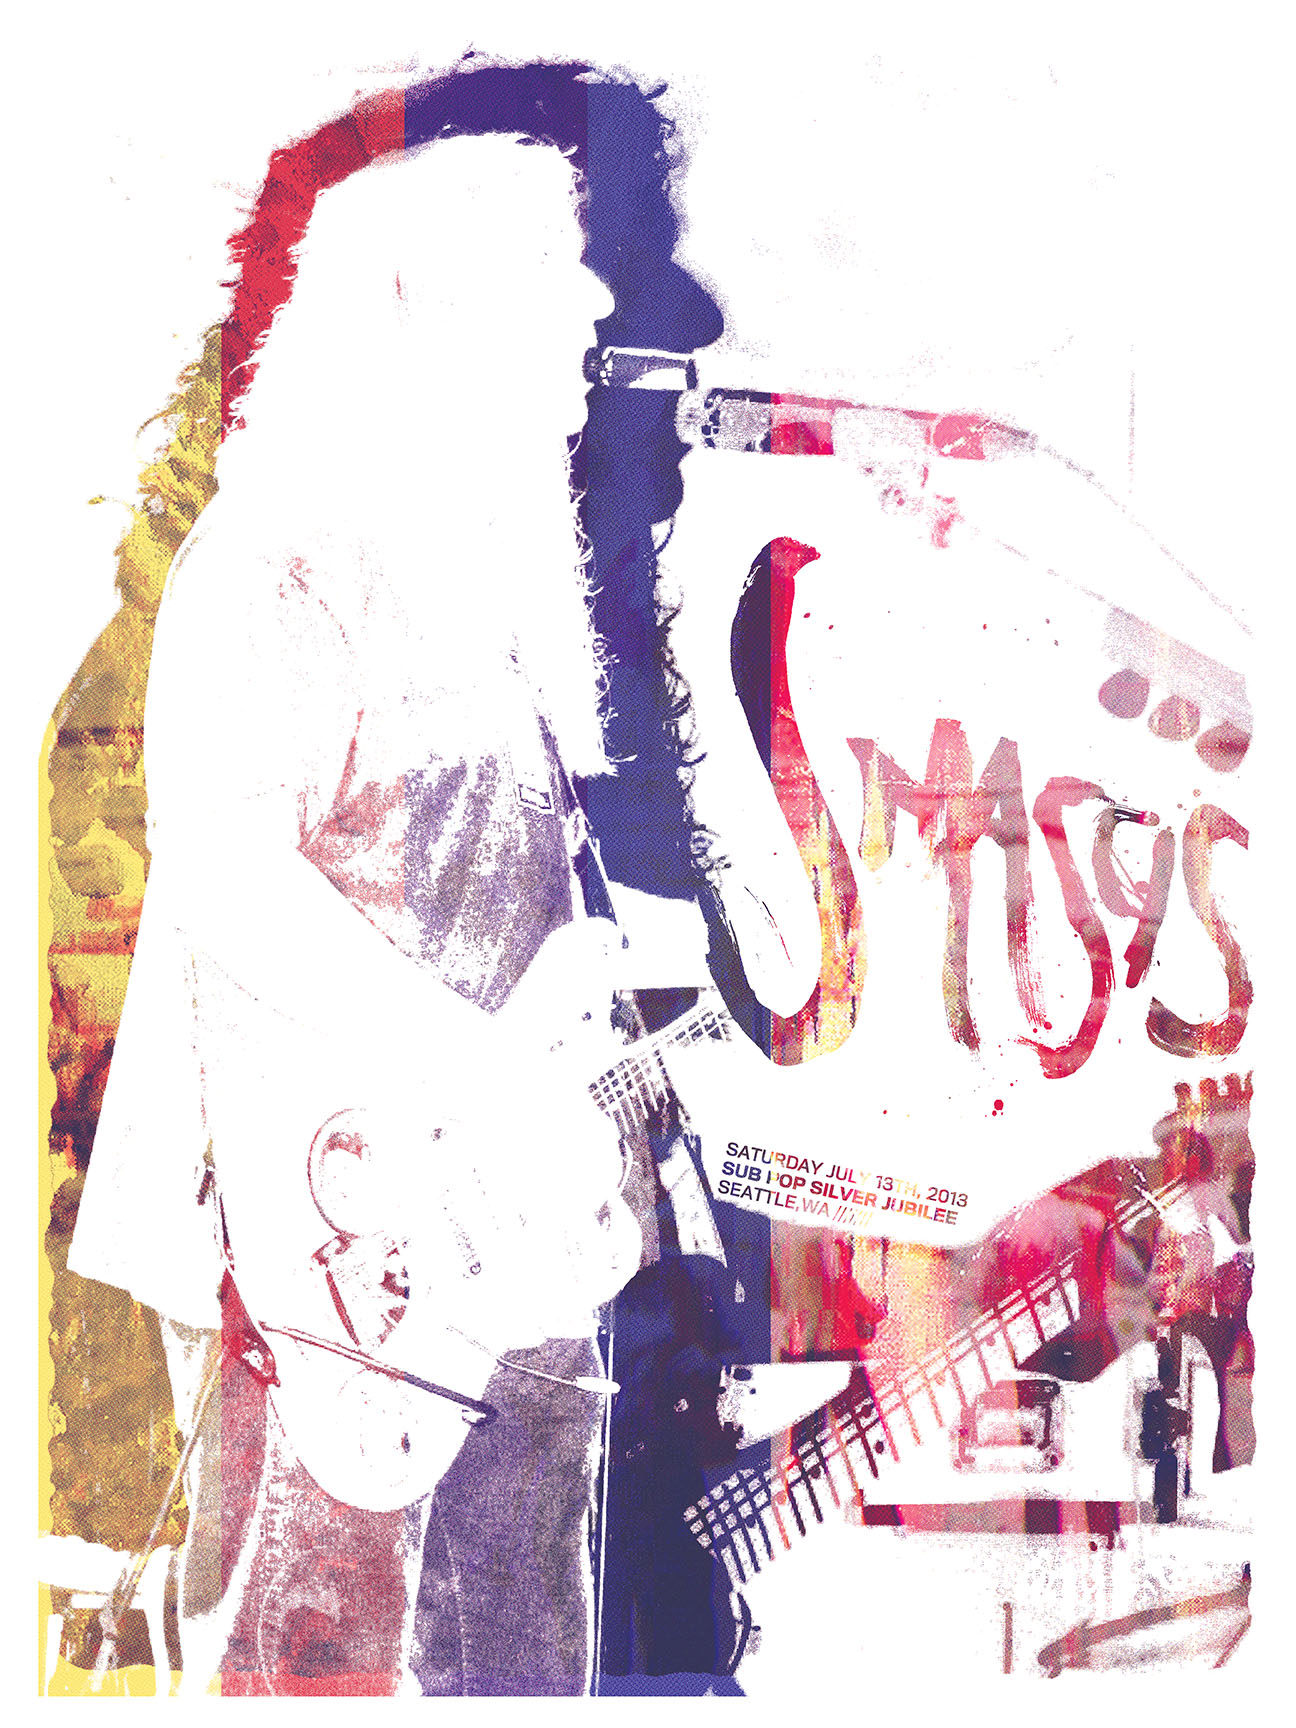 Poster design jeans - Image Image Image